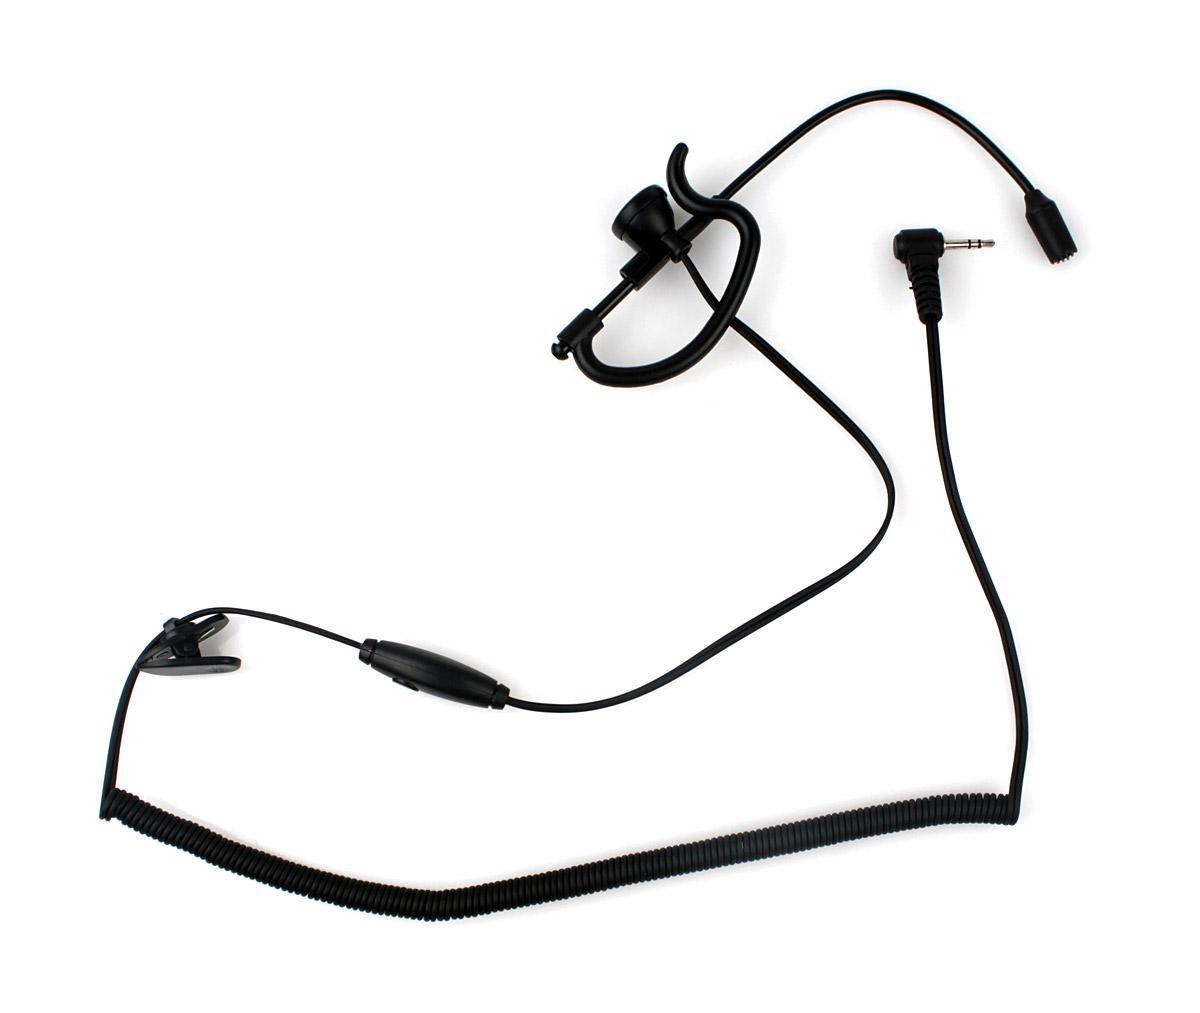 1 Pin Ear Rod Headphone For Motorola Two Way Radios 2 5mm